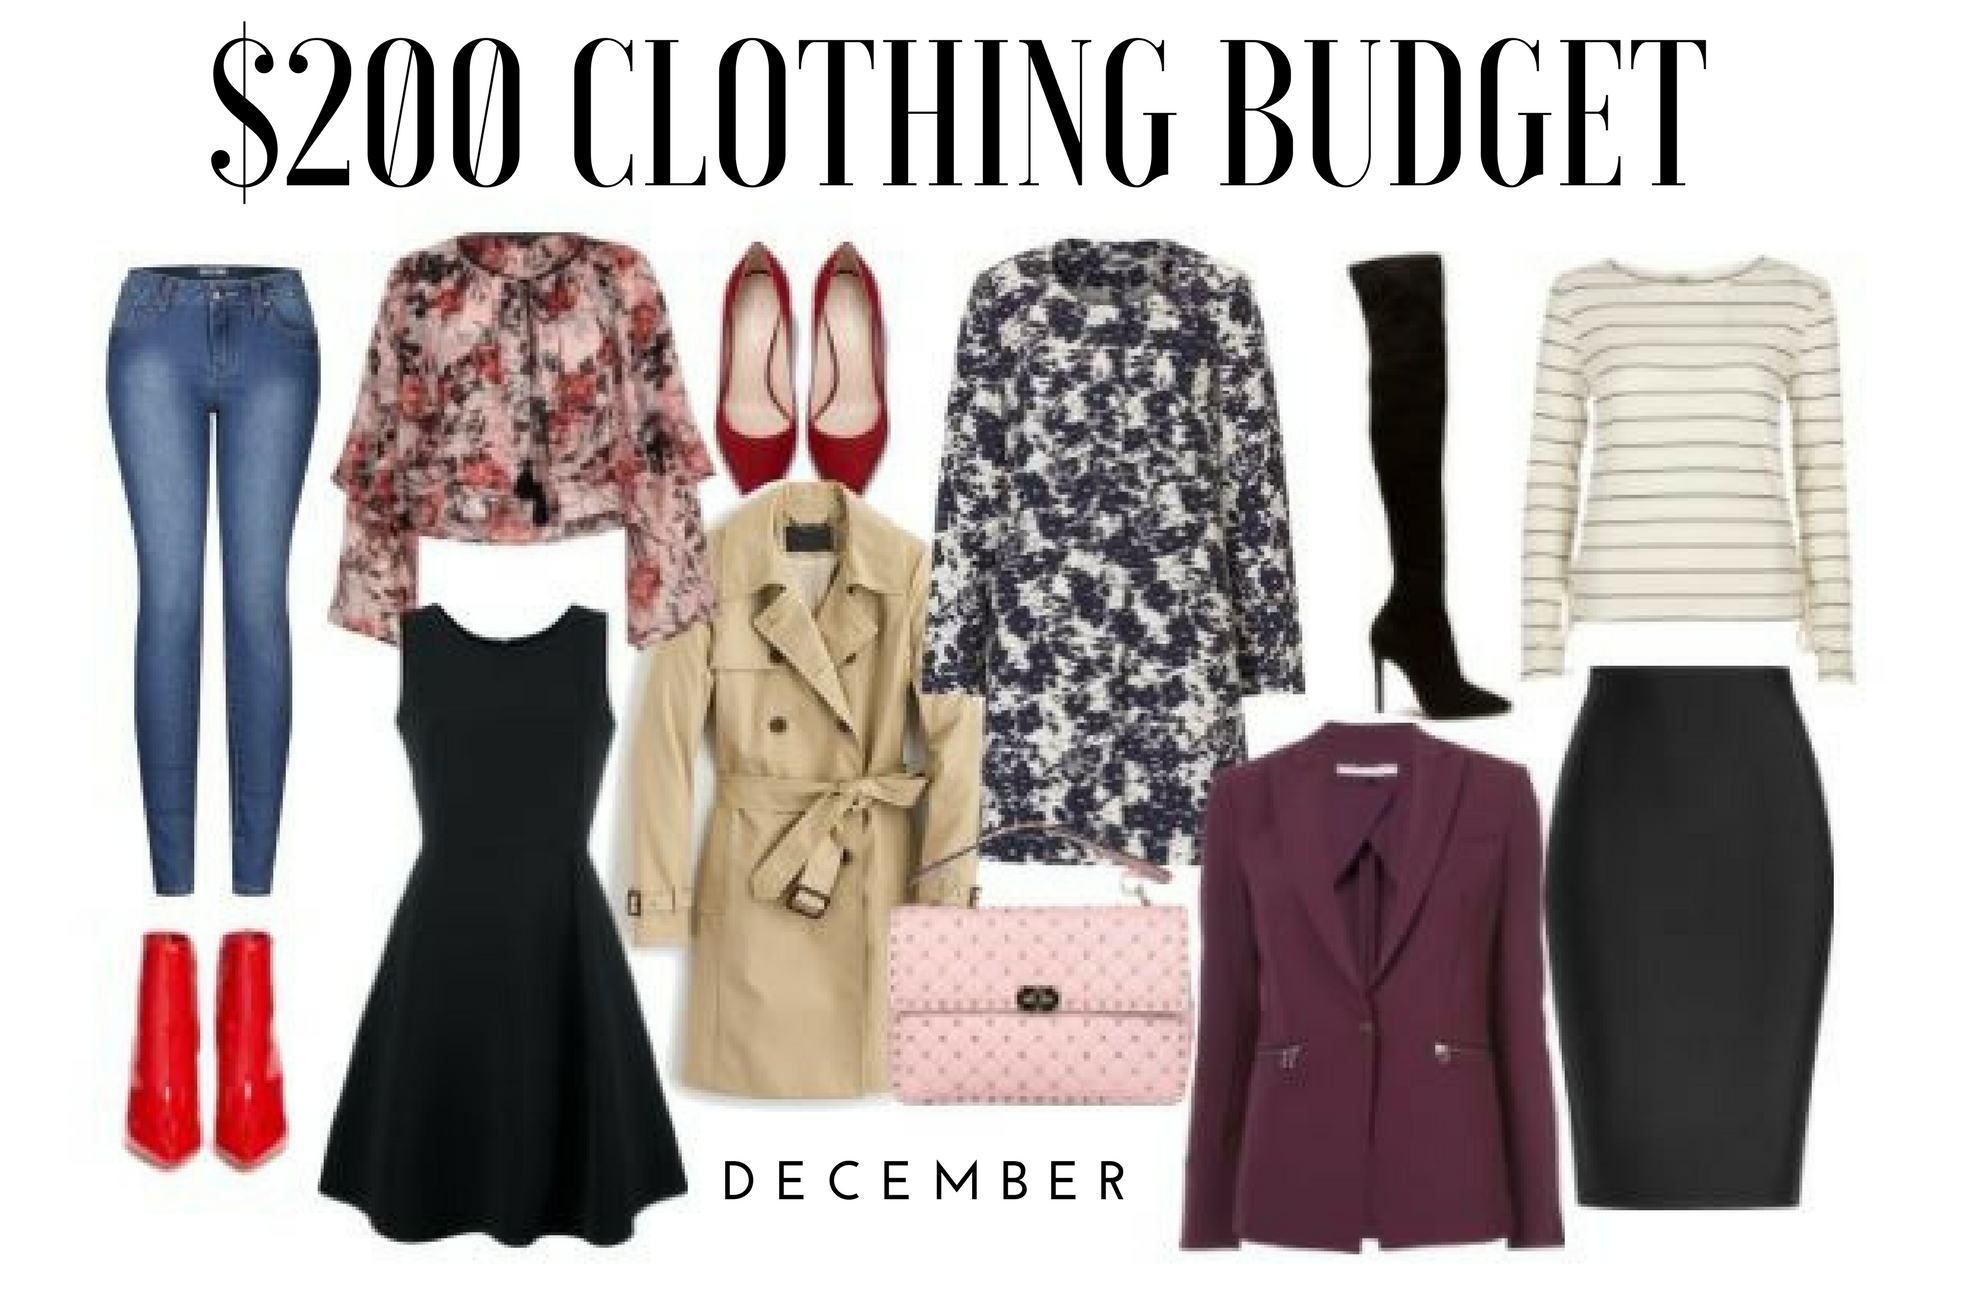 $200 Clothing Budget: December